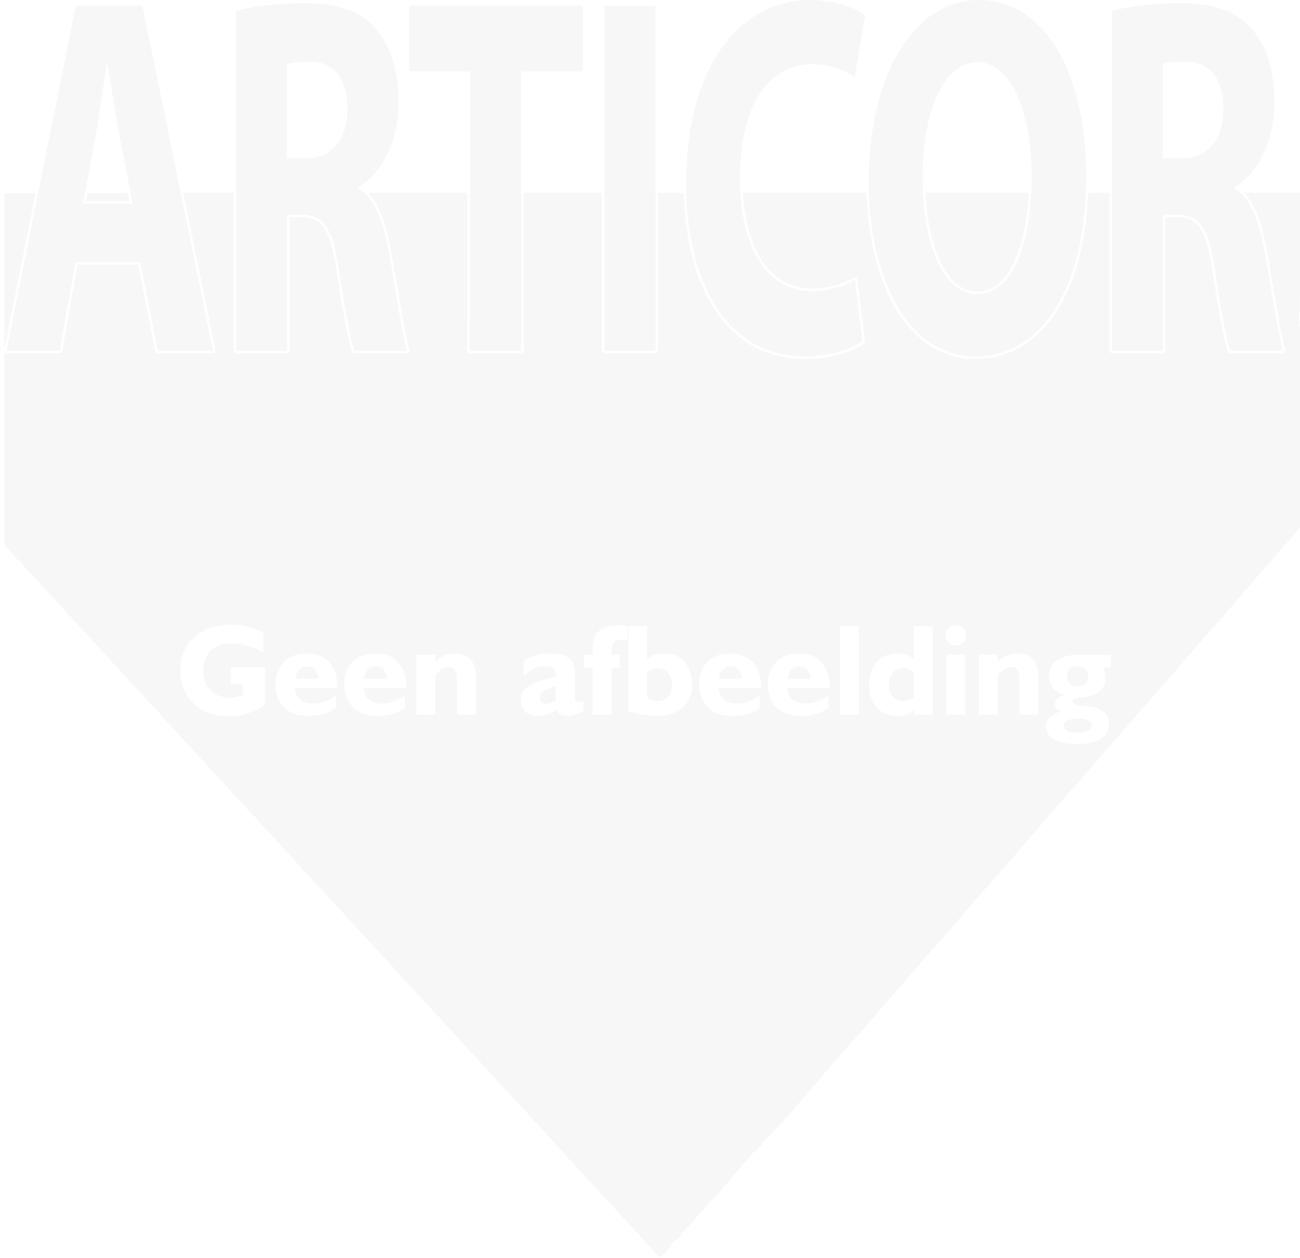 Tapse Kaars Groen